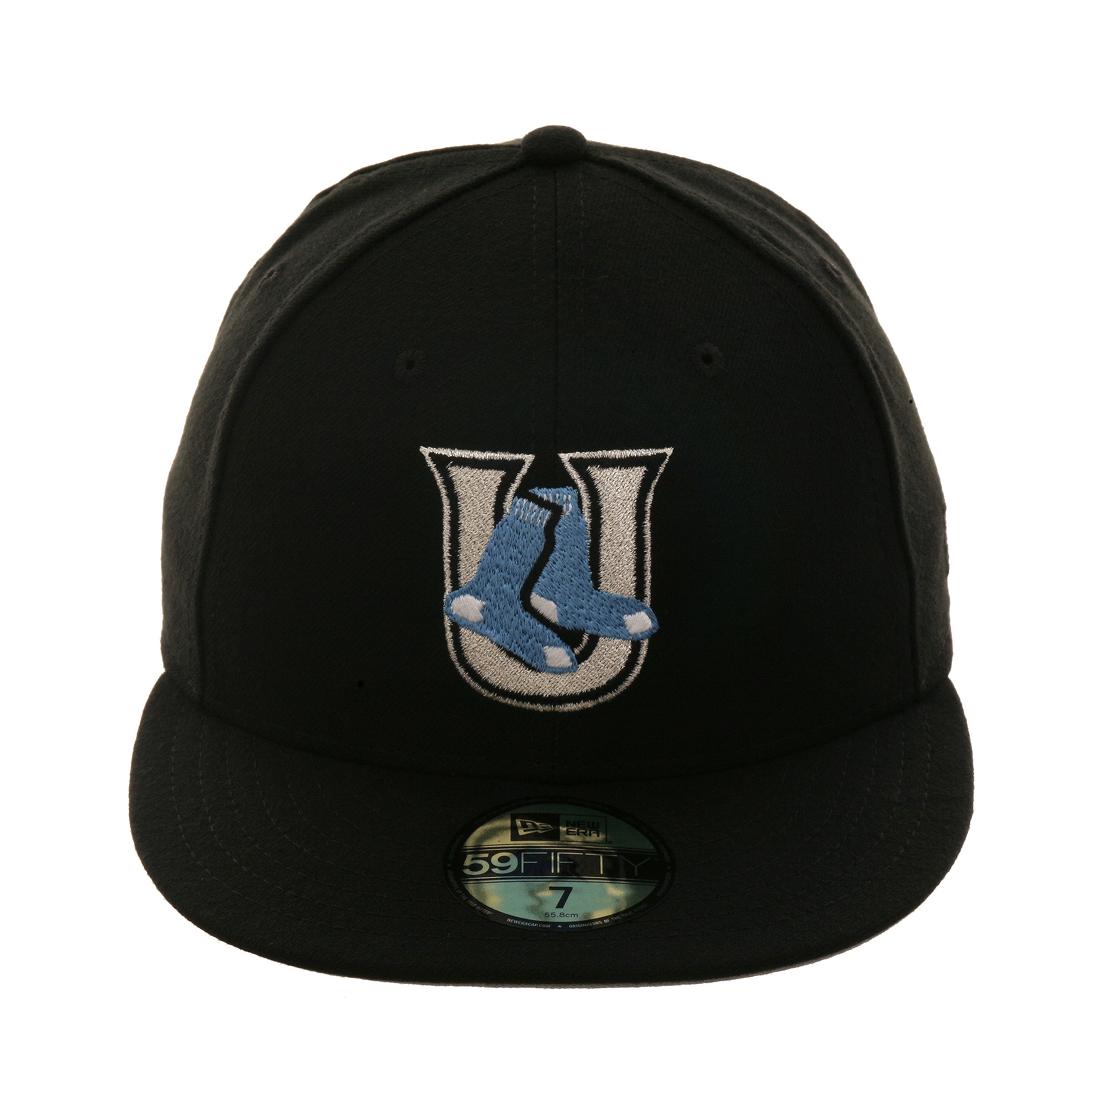 dfb8b74608f Exclusive New Era 59Fifty Utica Blue Sox Hat - Black